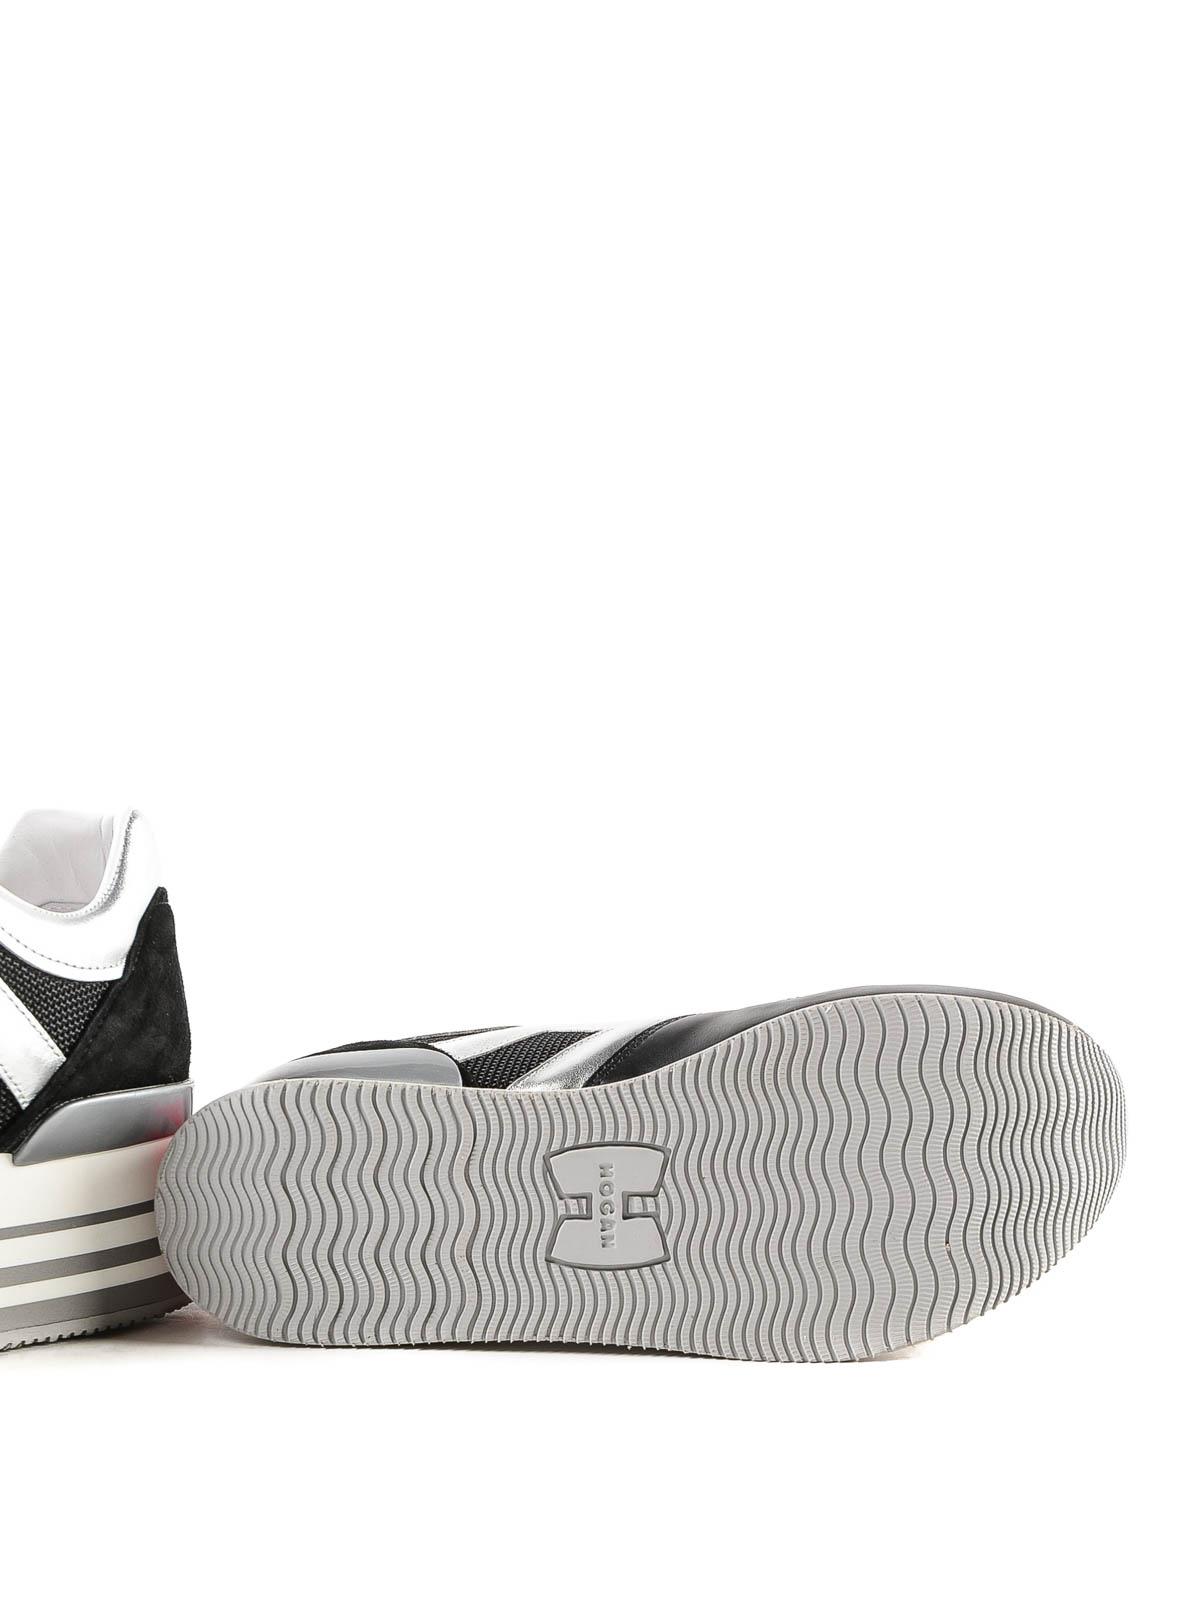 effdc101230 Hogan - Maxi H222 black striped platform sneakers - trainers ...